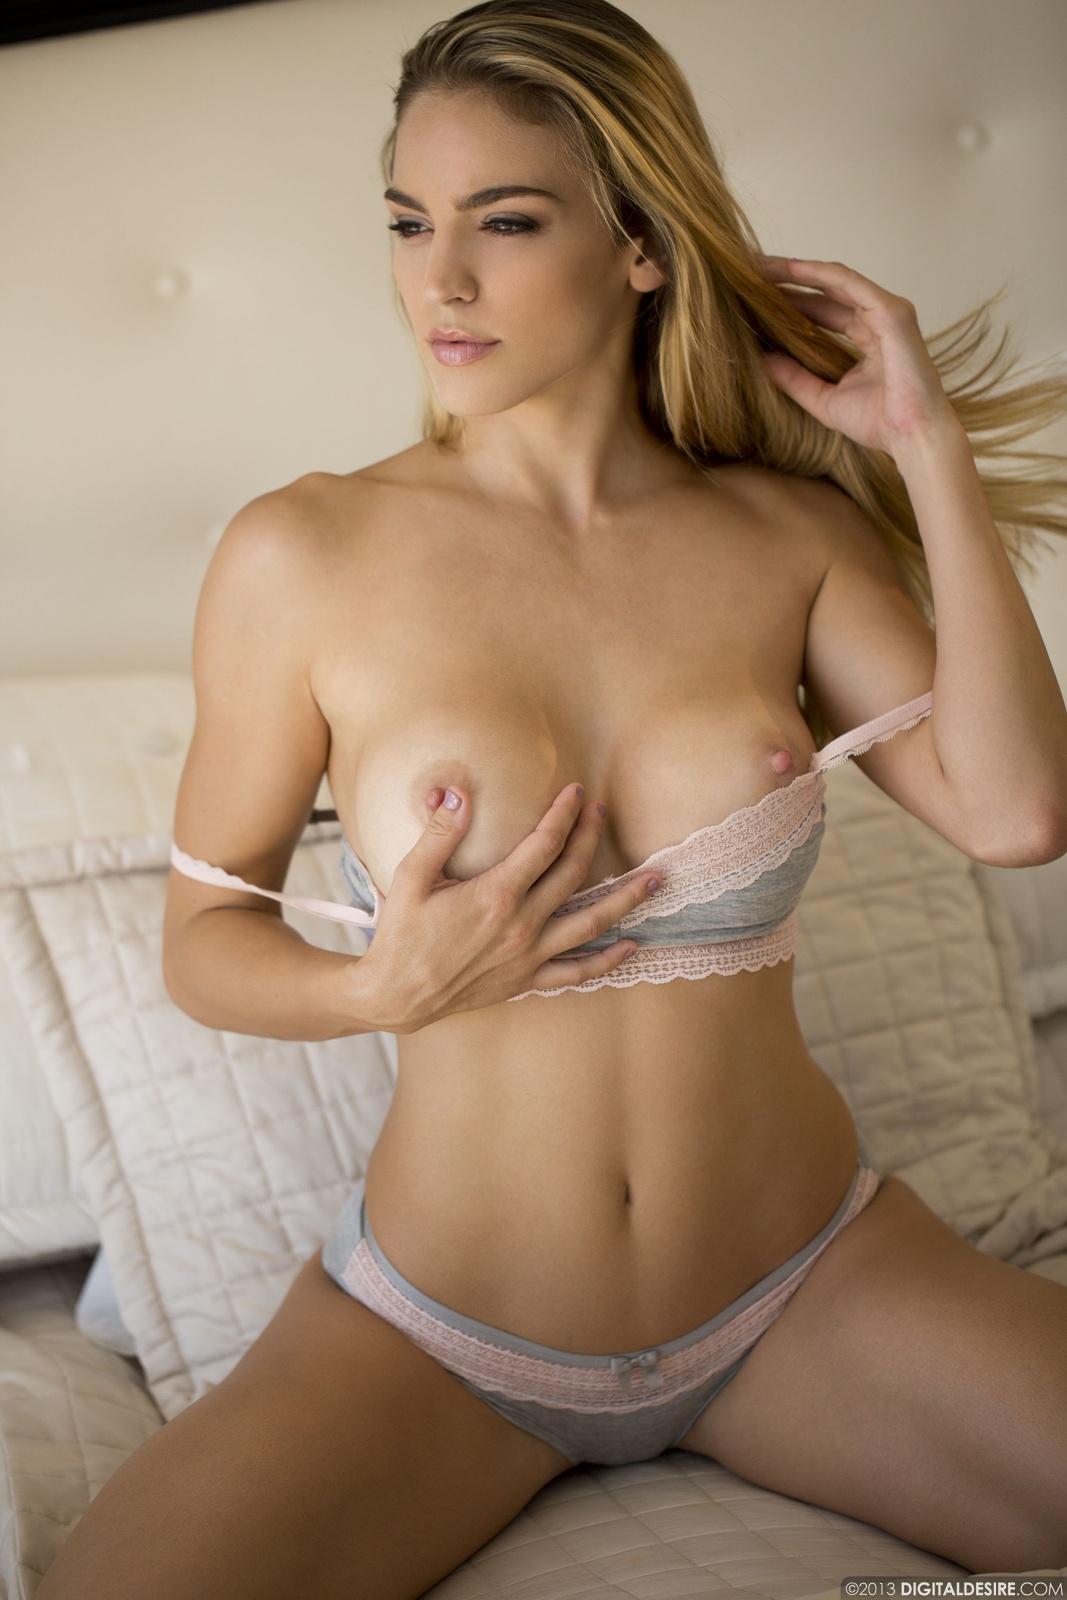 thin women naked fuck big cock gif